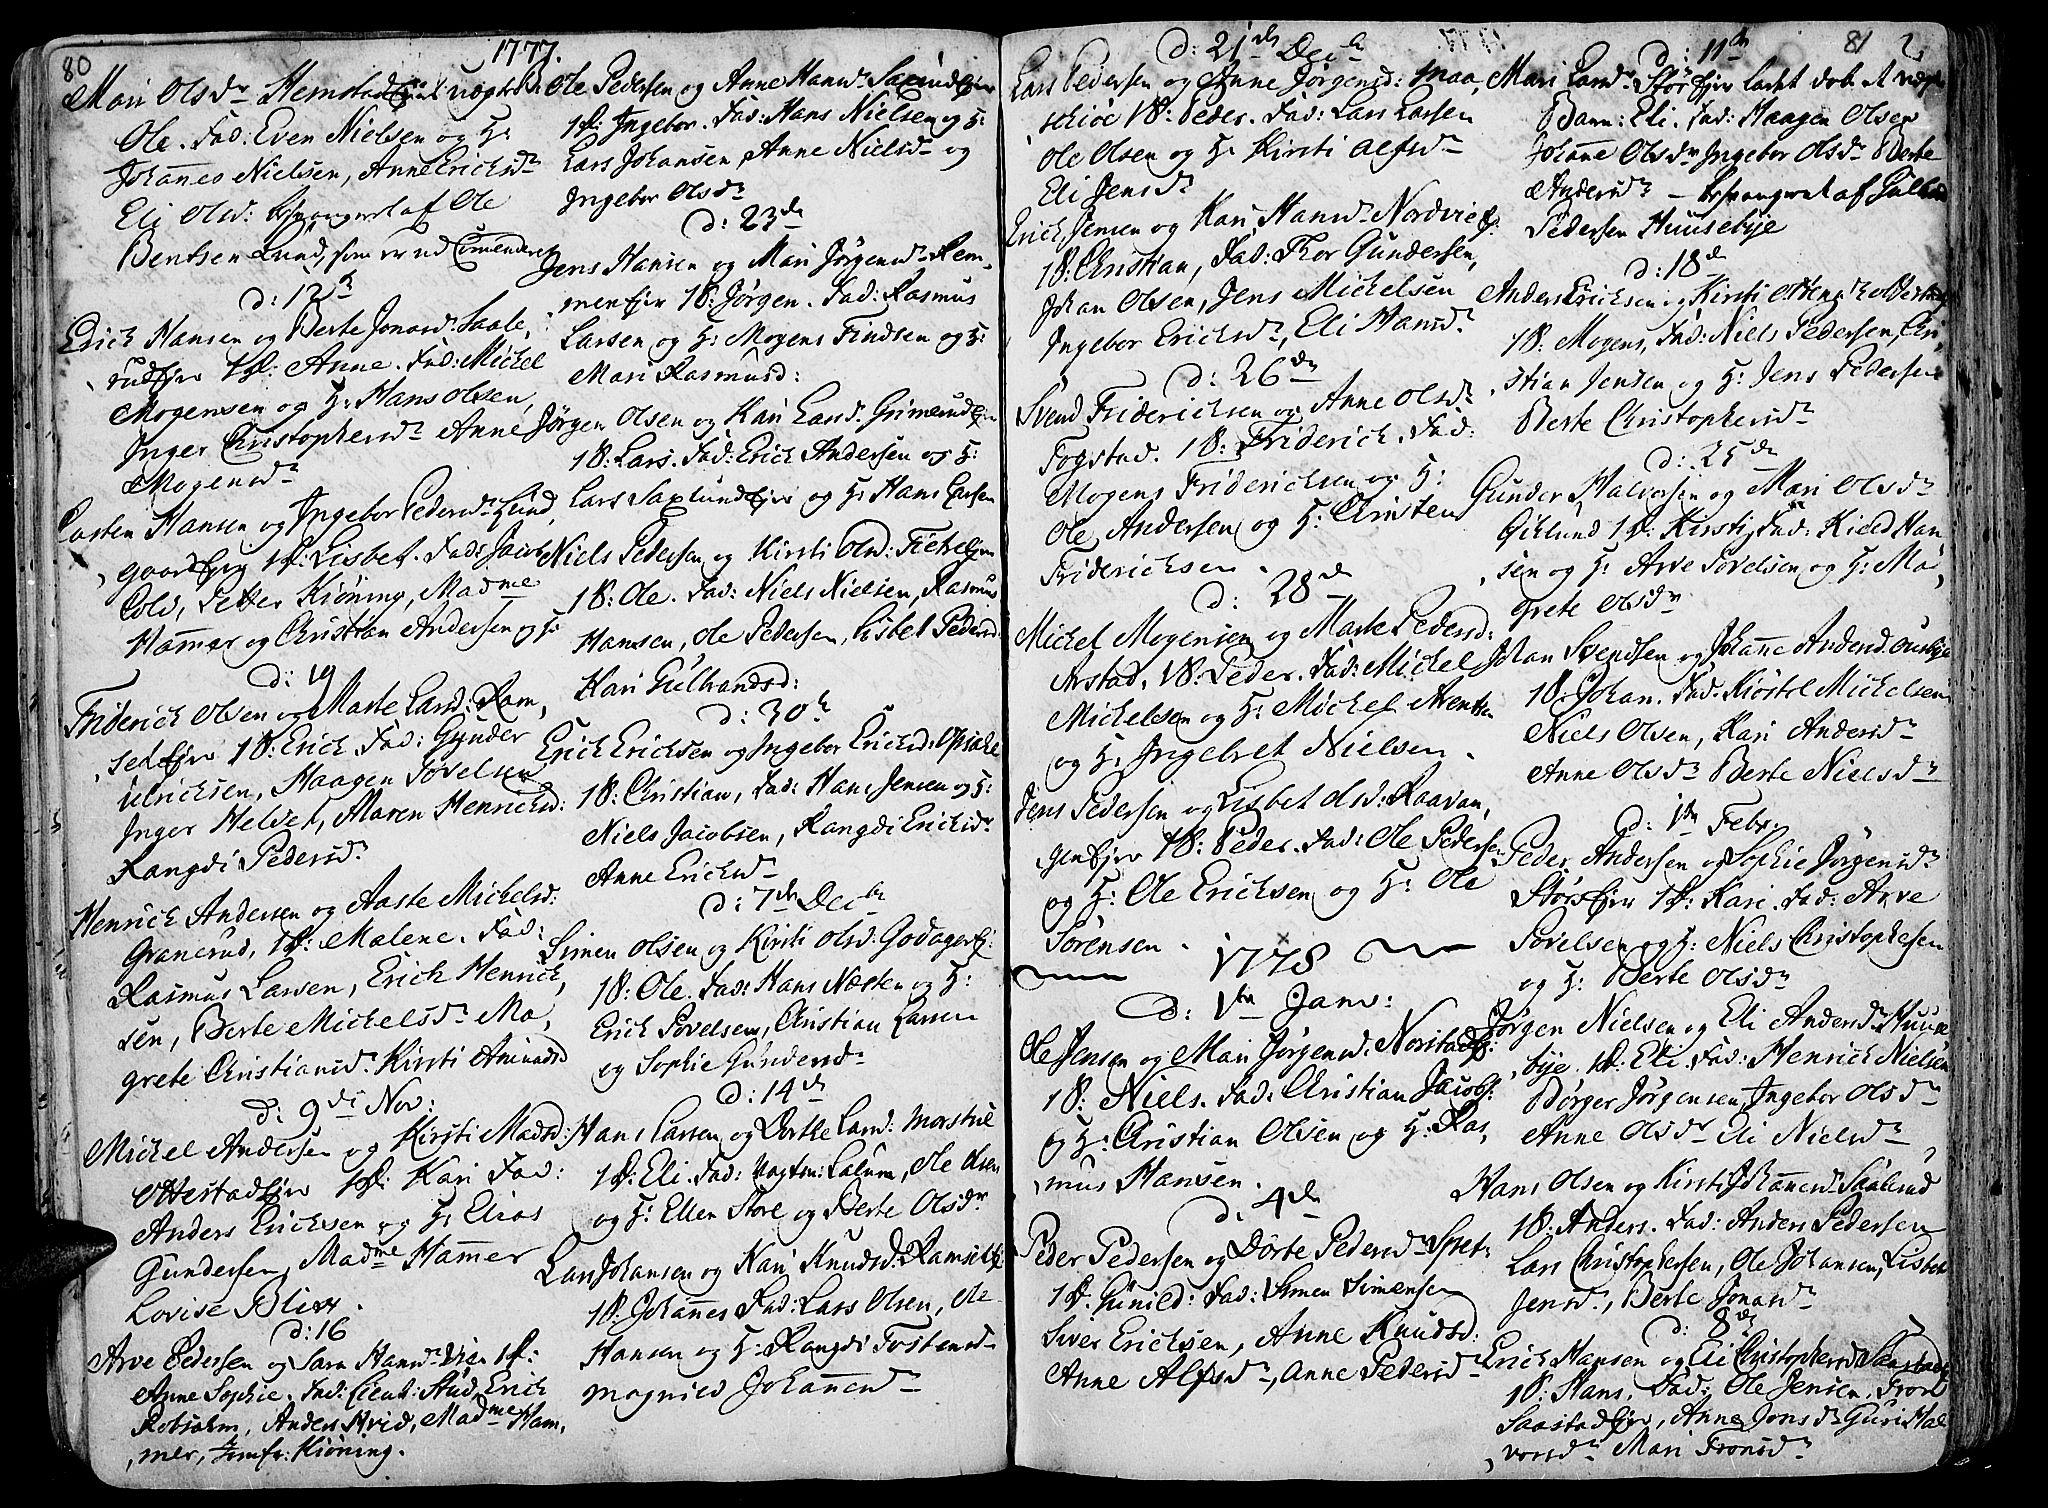 SAH, Stange prestekontor, K/L0006: Ministerialbok nr. 6, 1762-1787, s. 80-81